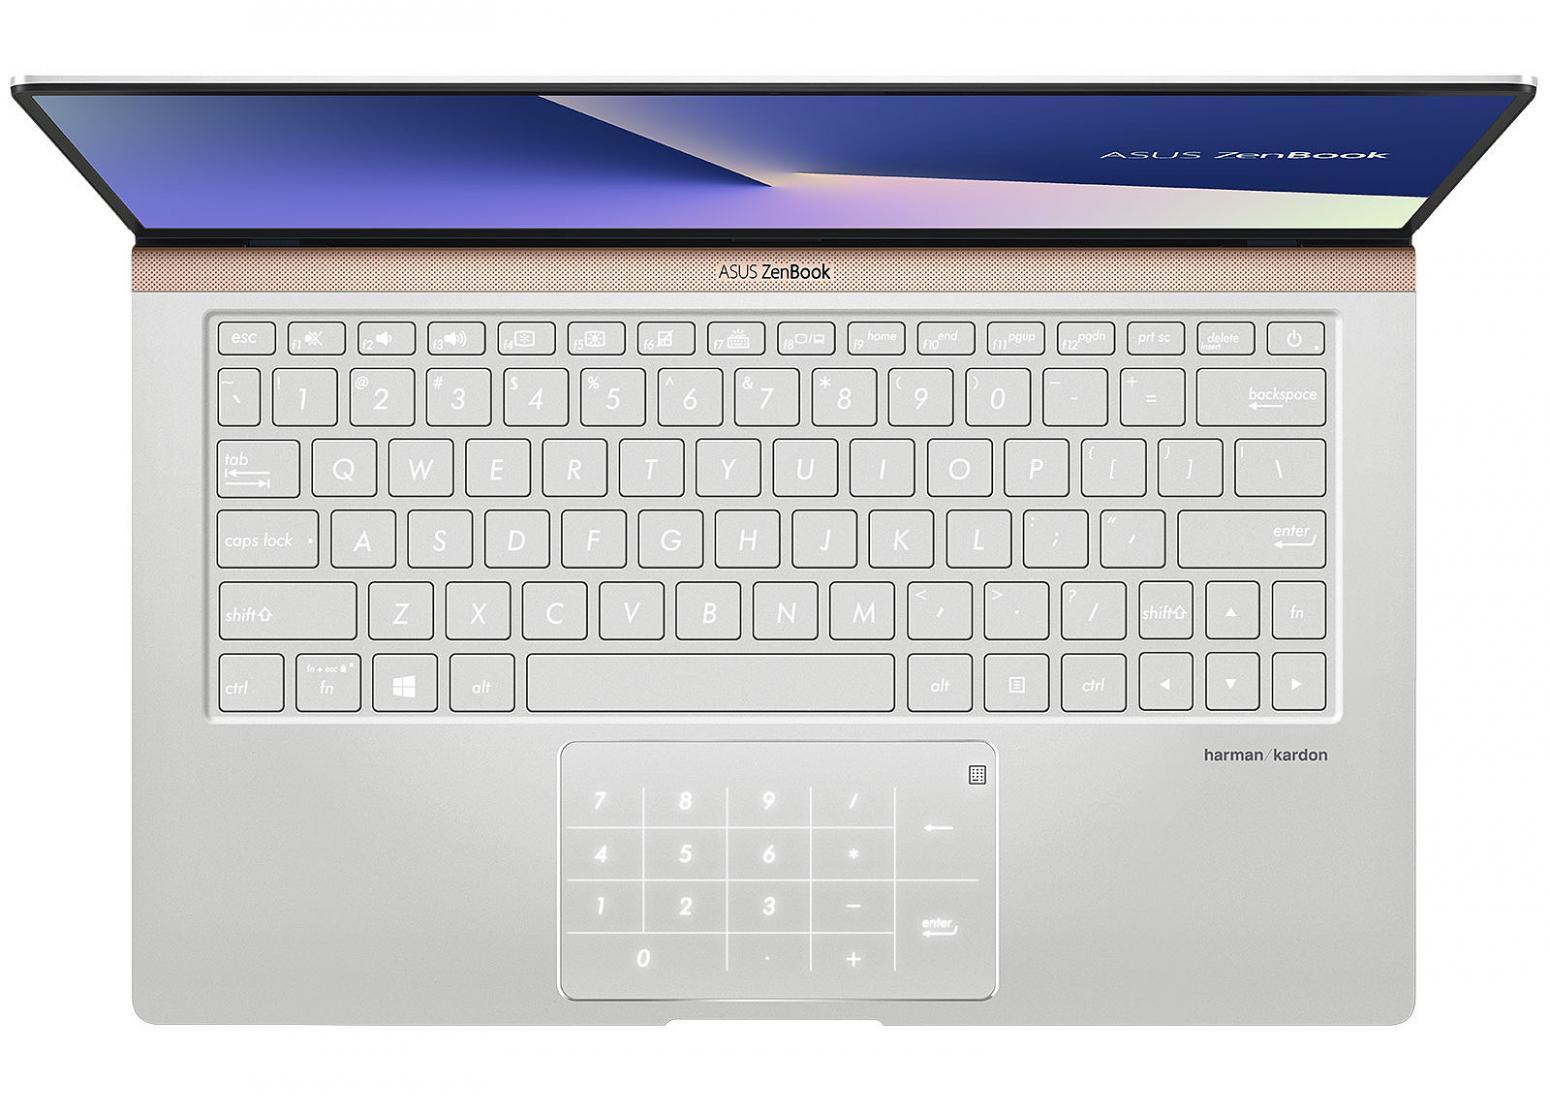 Ordinateur portable Asus Zenbook 13 UX333FA-A3238R Argent - NumPad, Pro - photo 3